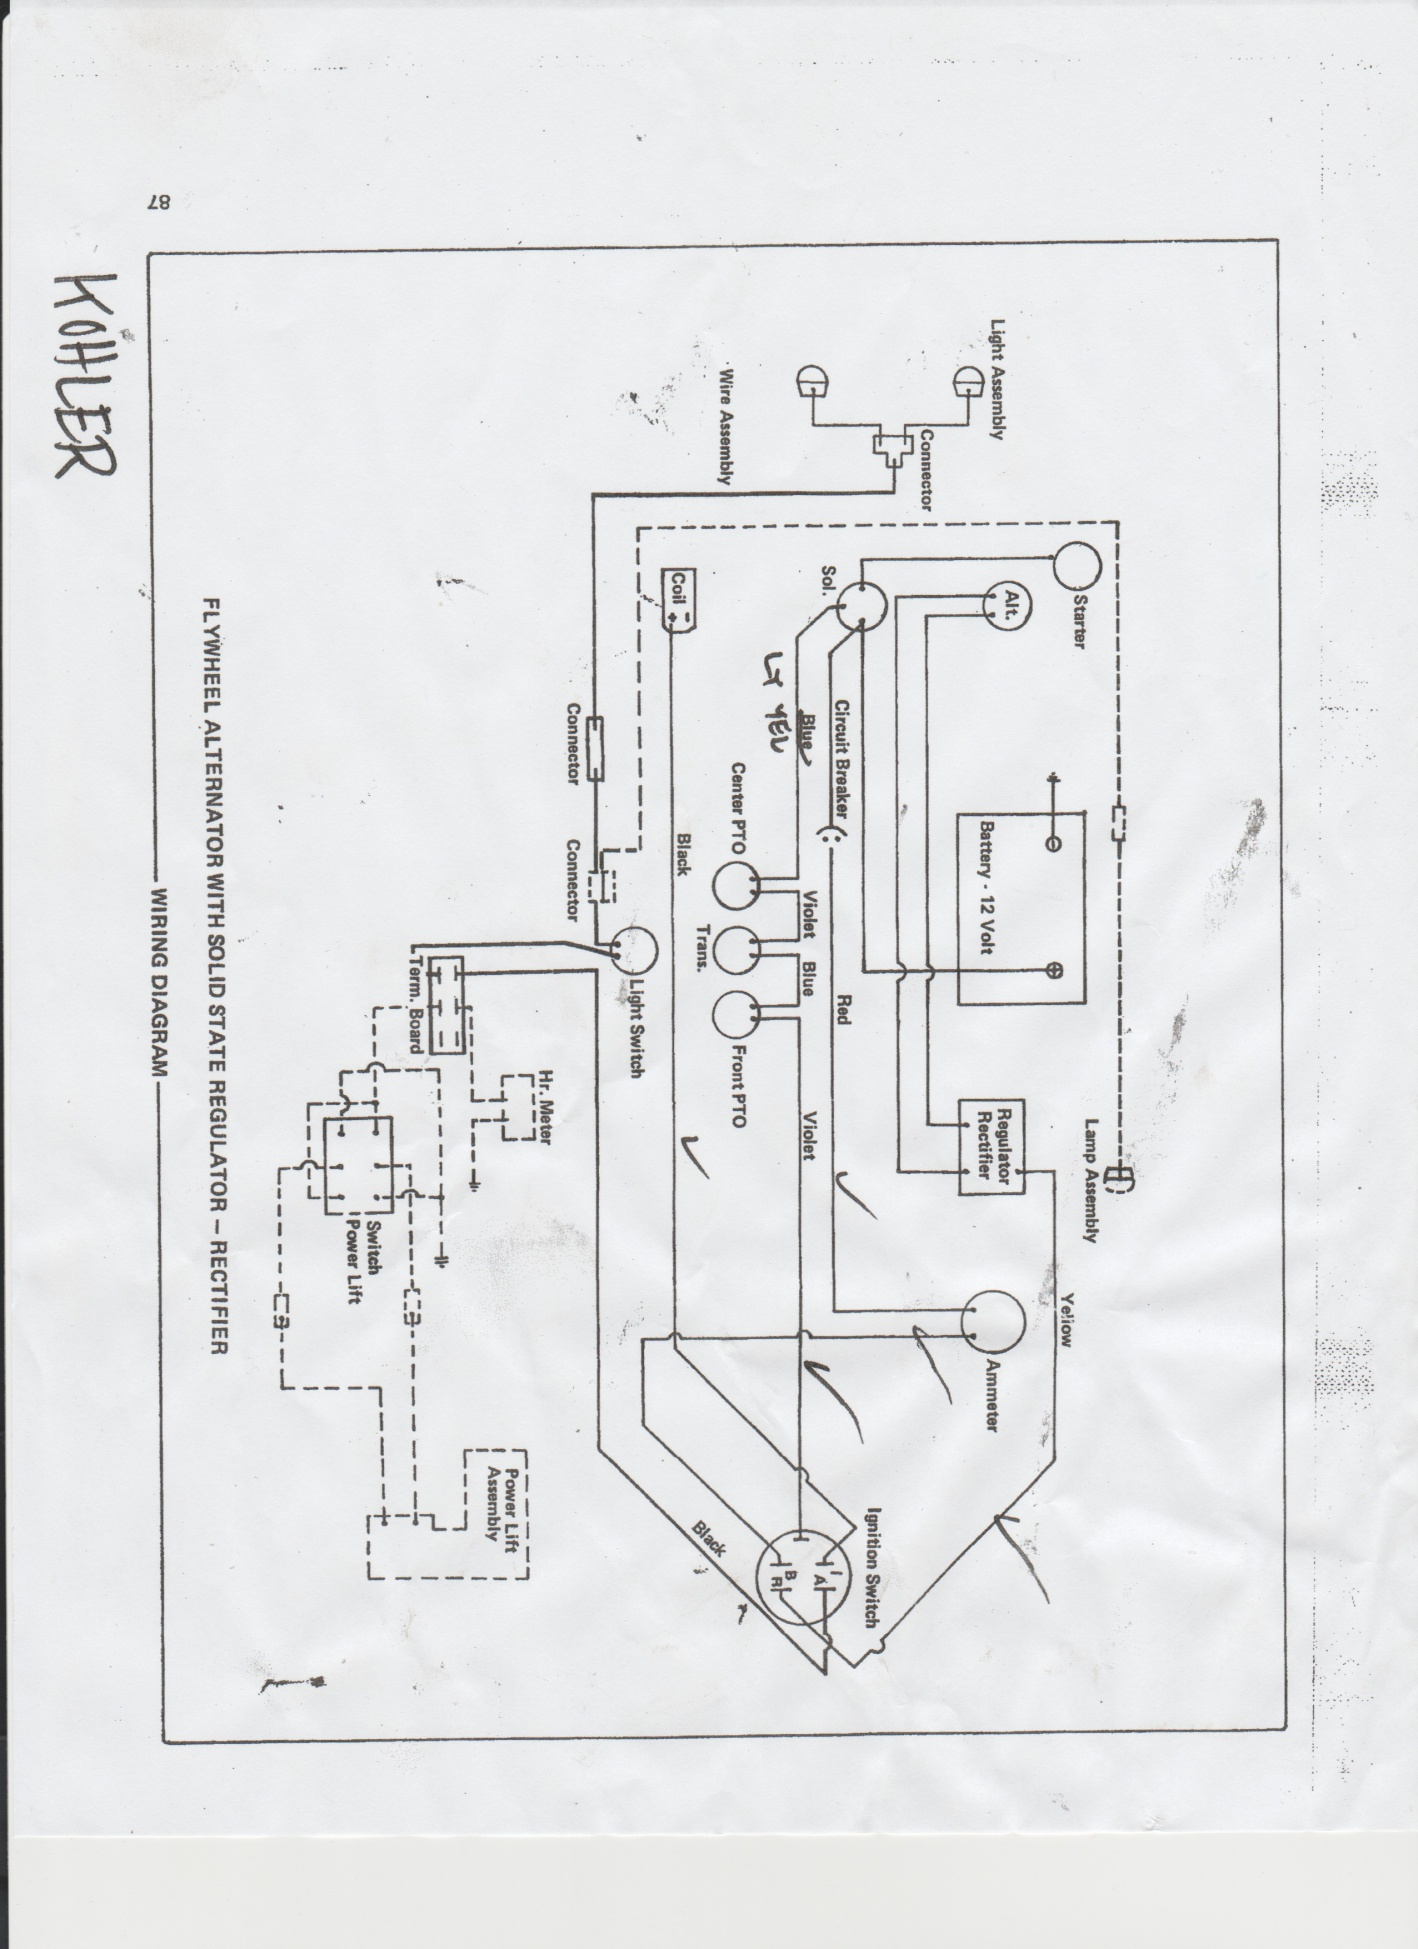 simplicity lawn mower wiring diagram wiring diagram for allis 710  simplicity 7010  my tractor forum  wiring diagram for allis 710